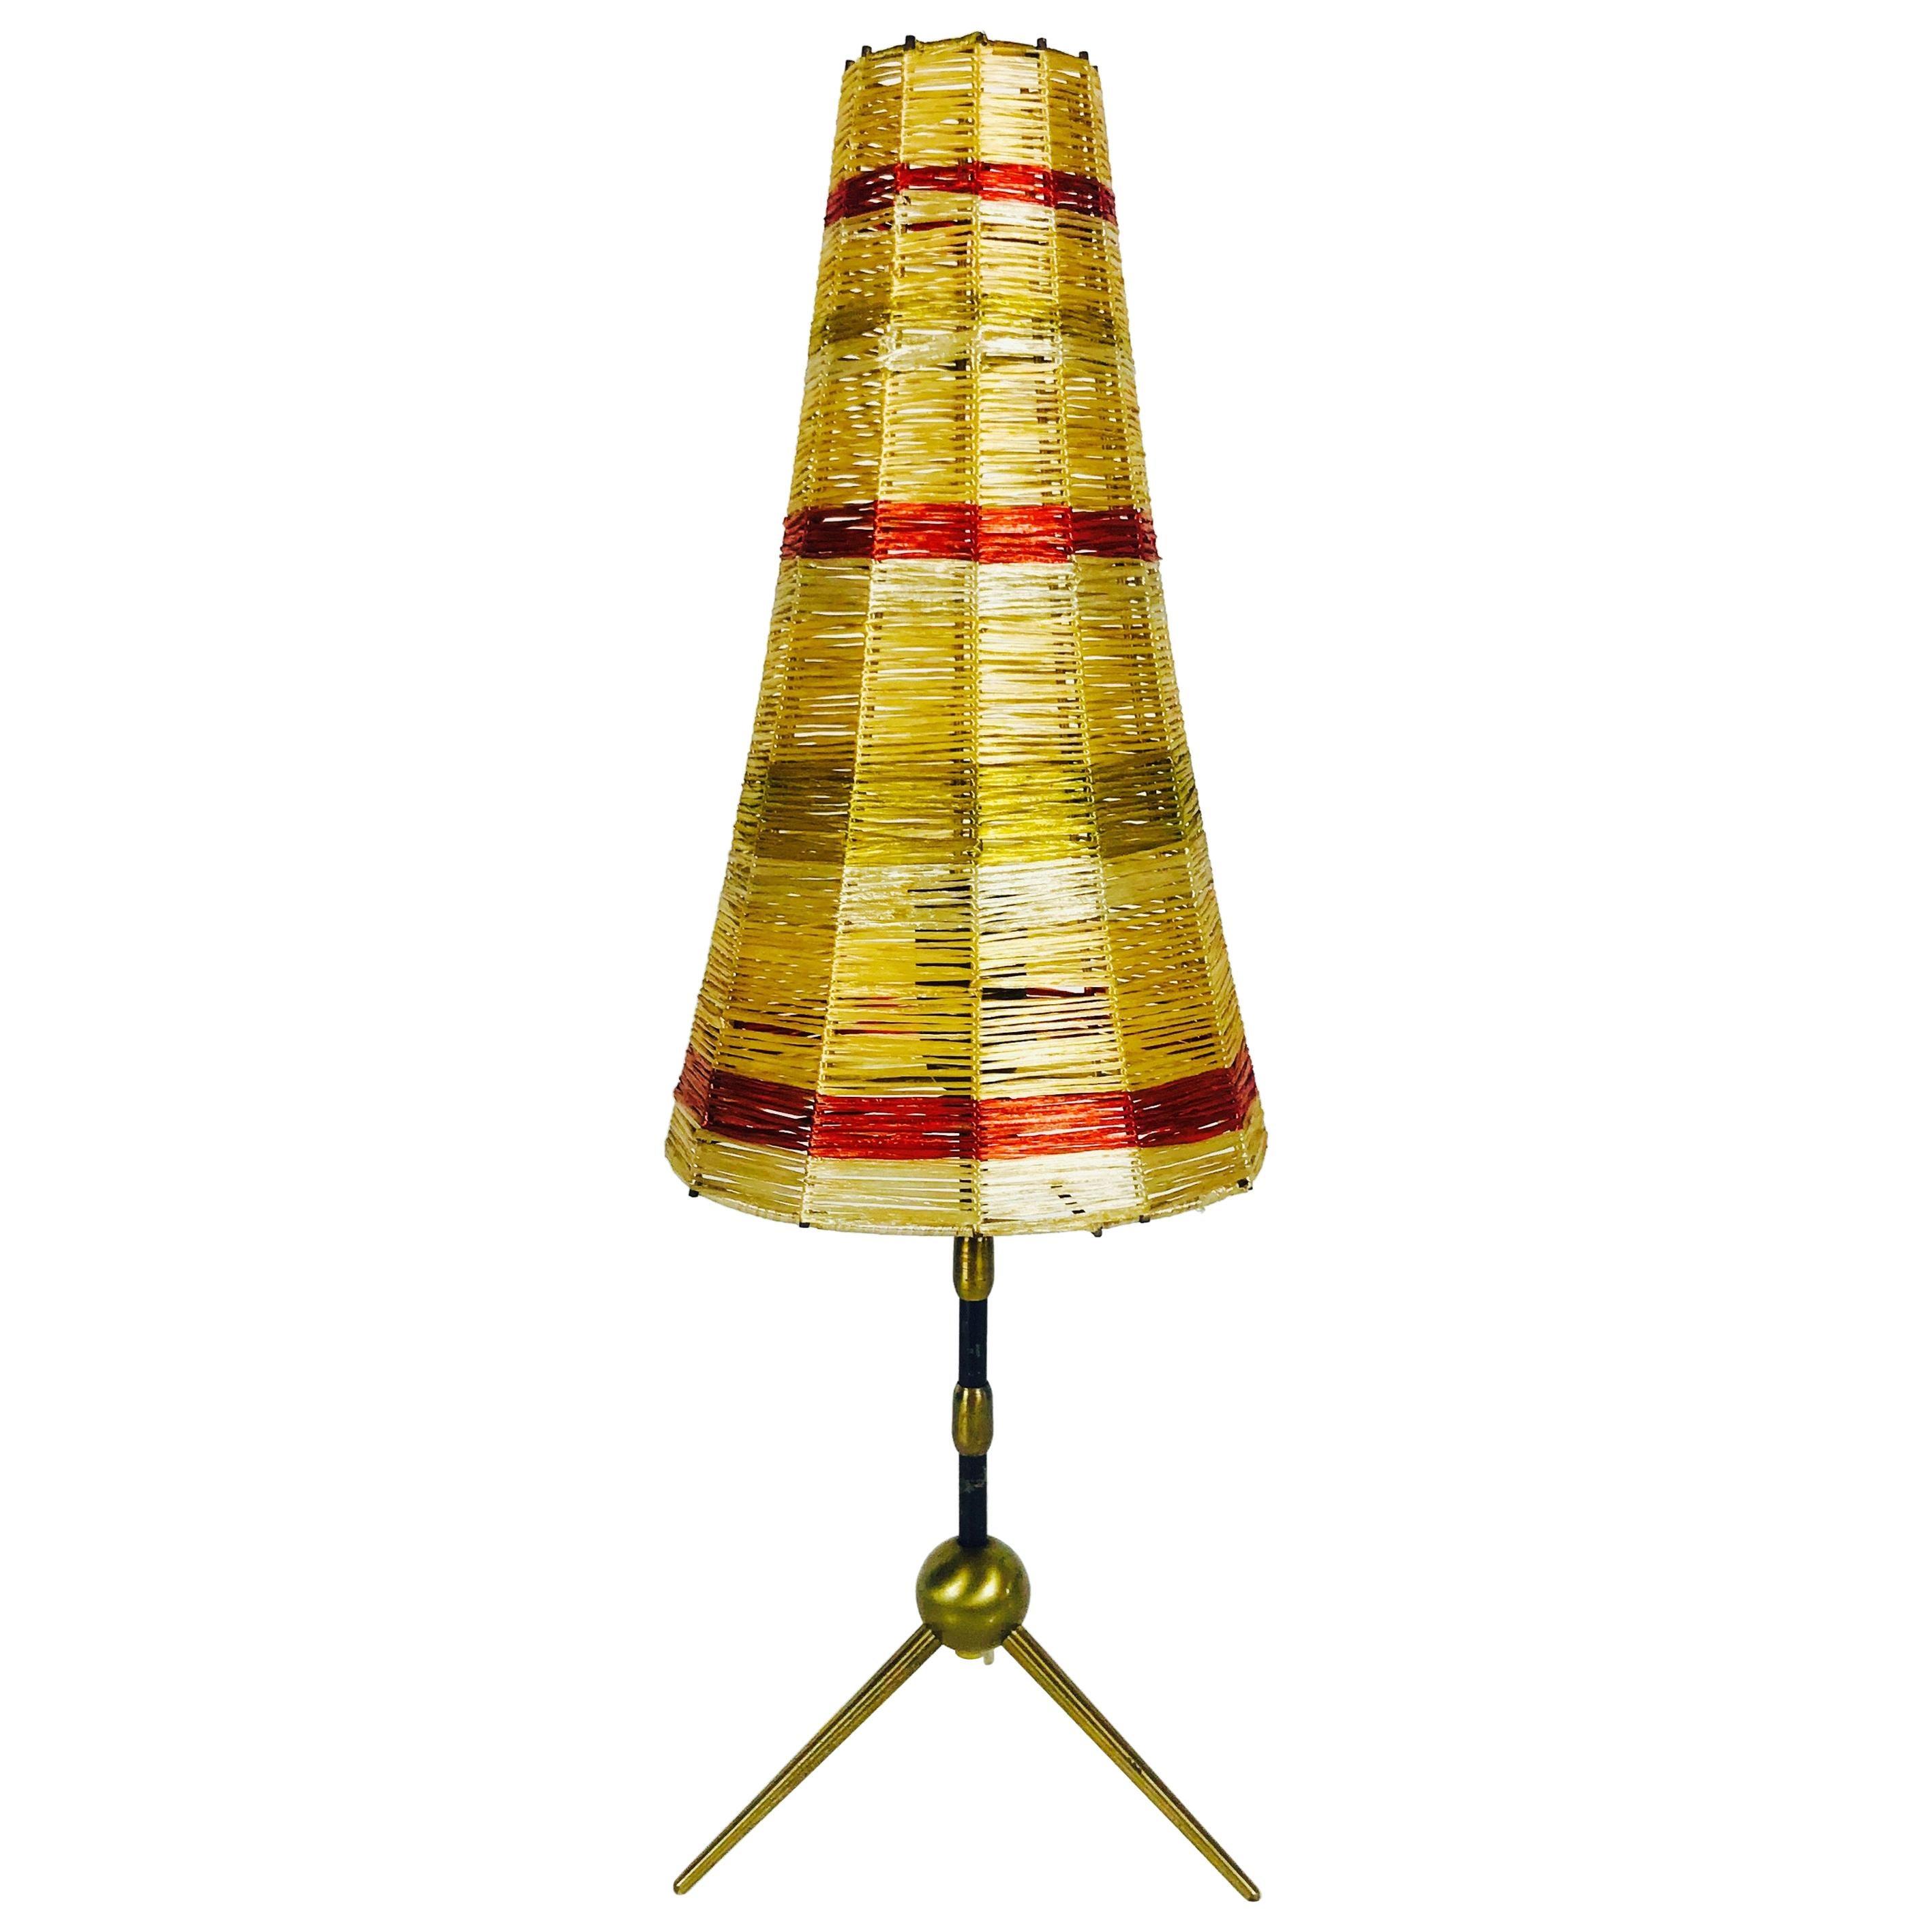 Midcentury Sputnik Brass Table Lamp, 1950s